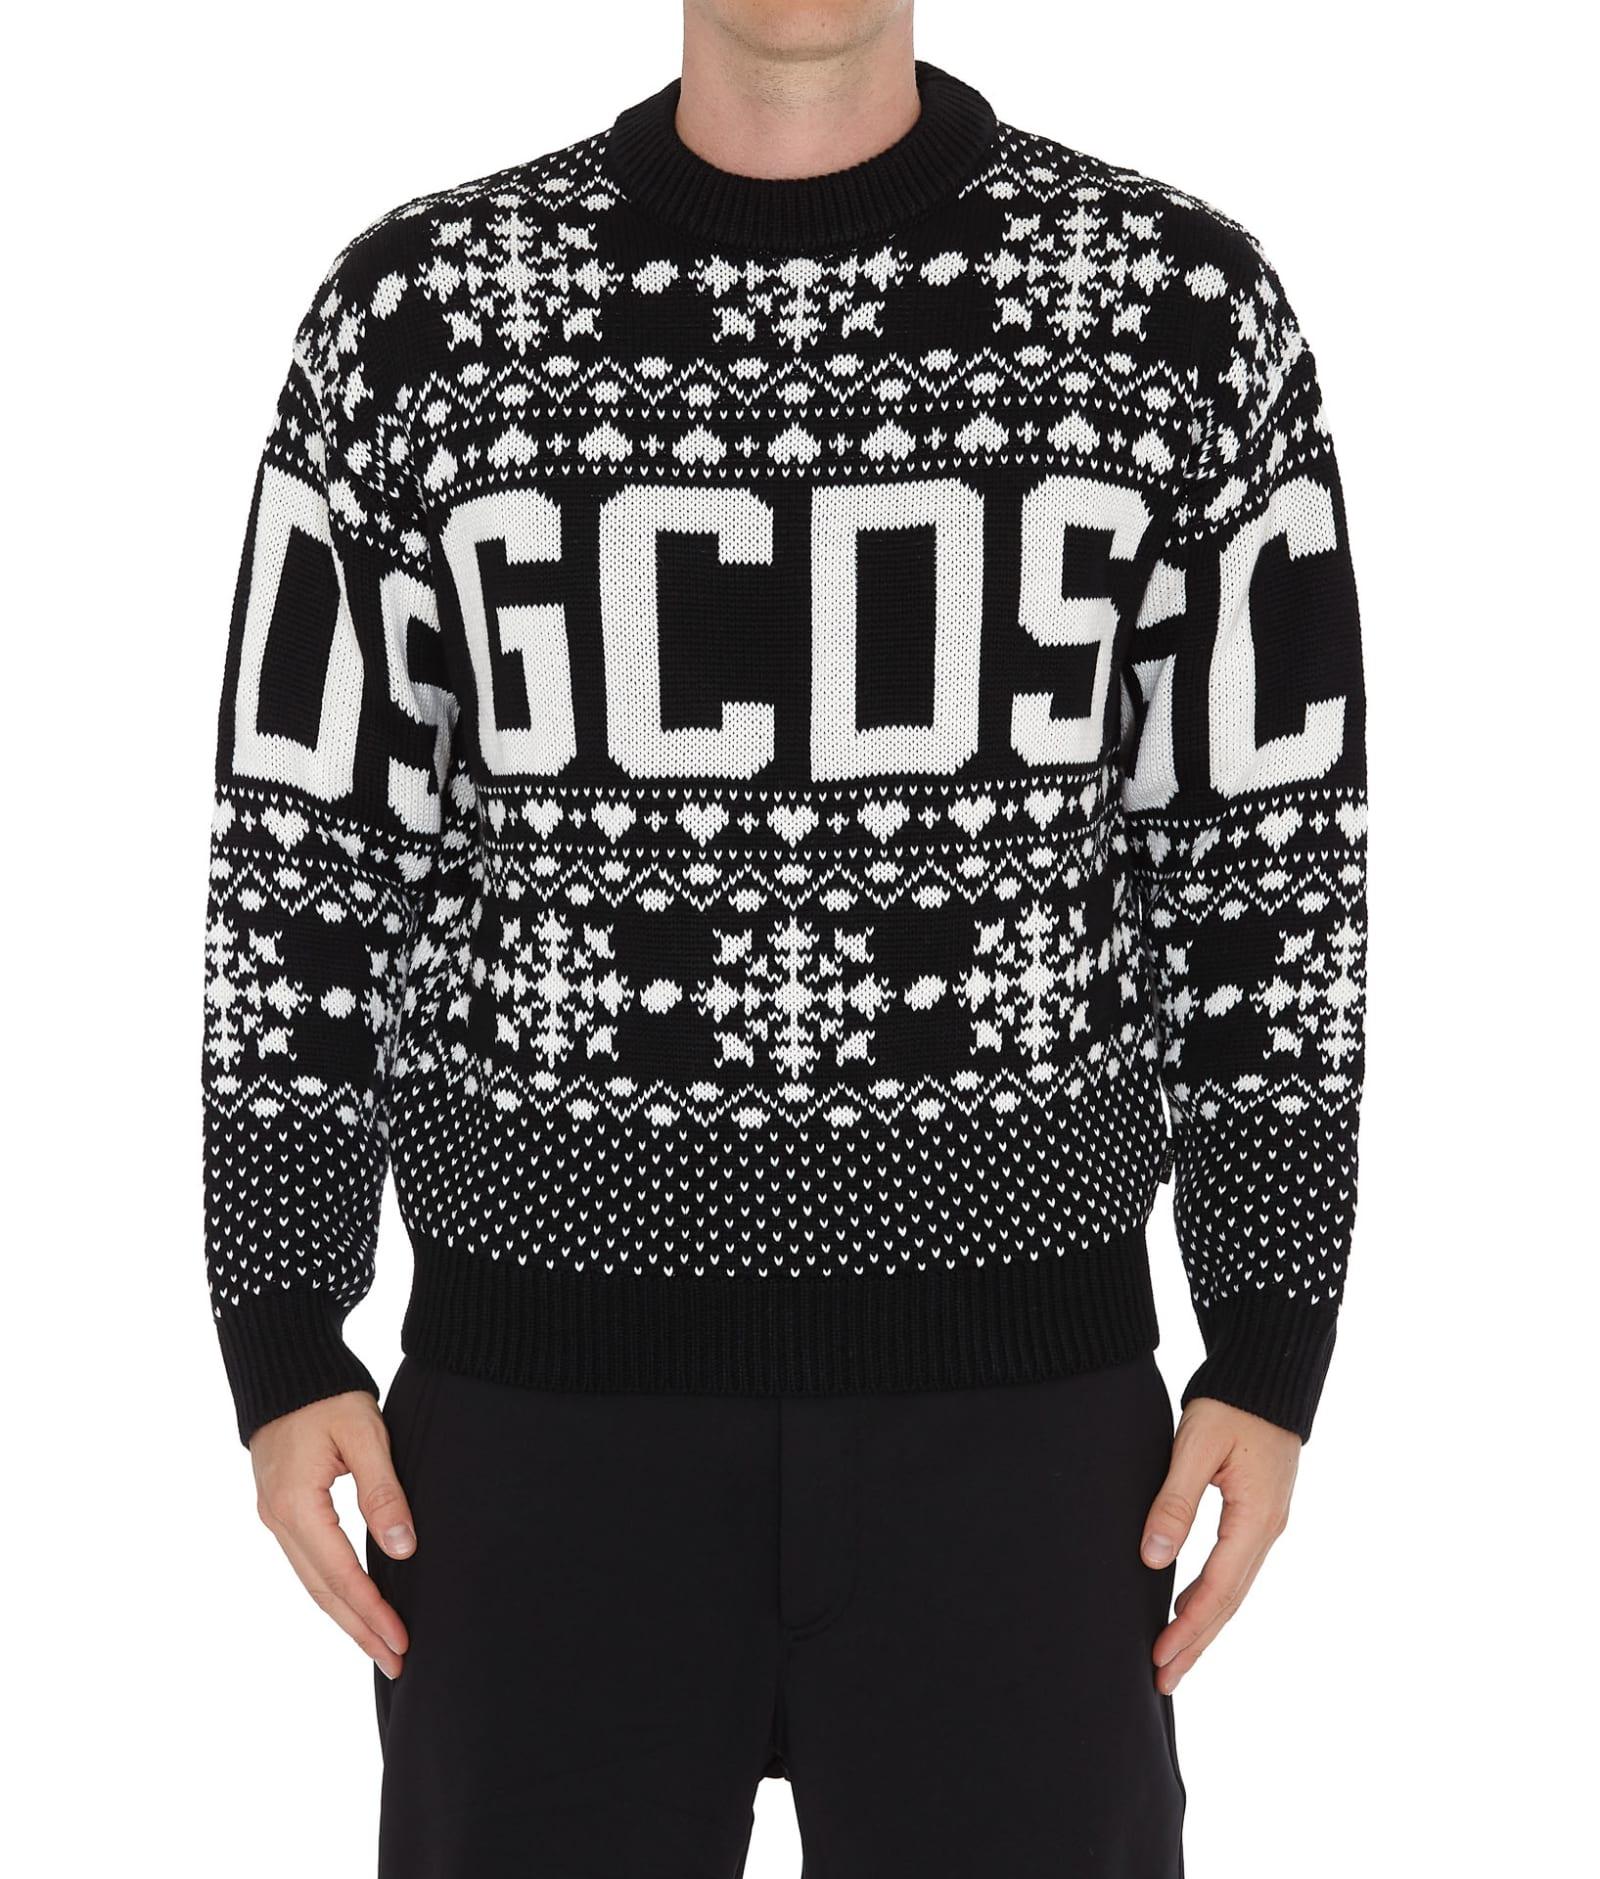 Gcds Sweaters CHRISTMAS SWEATER